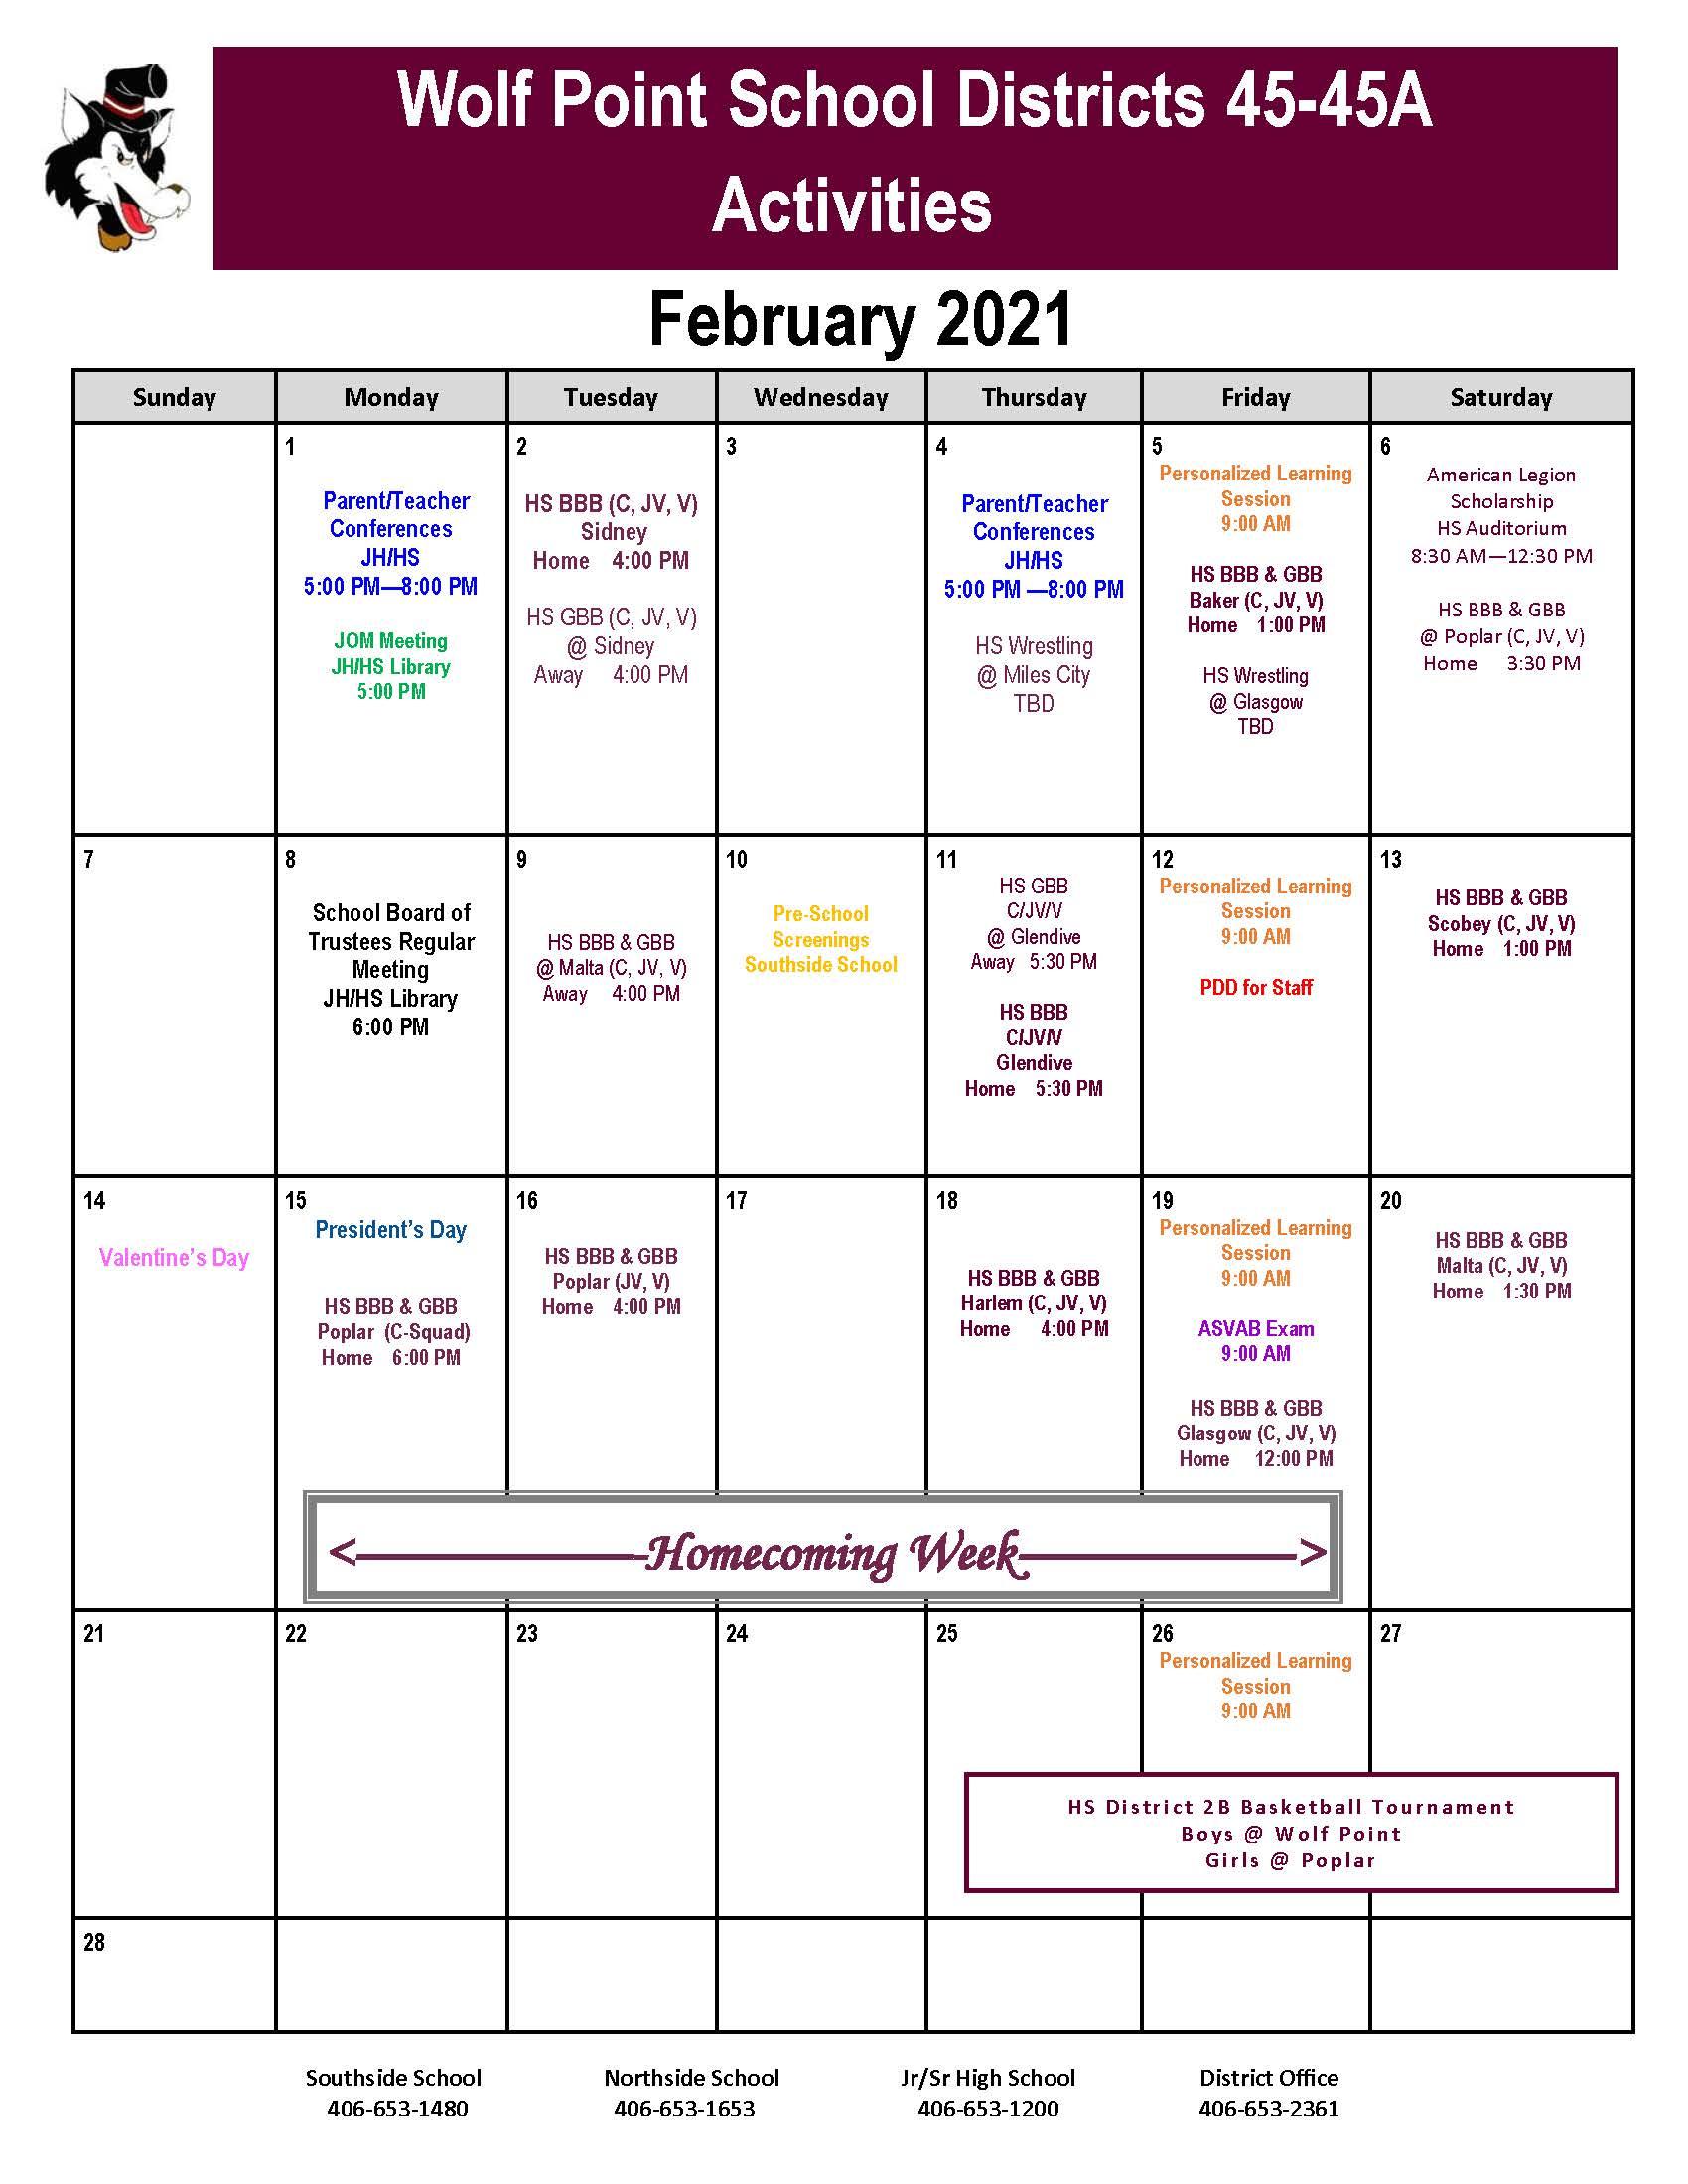 ACTIVITY CALENDAR_FEBRUARY 2021